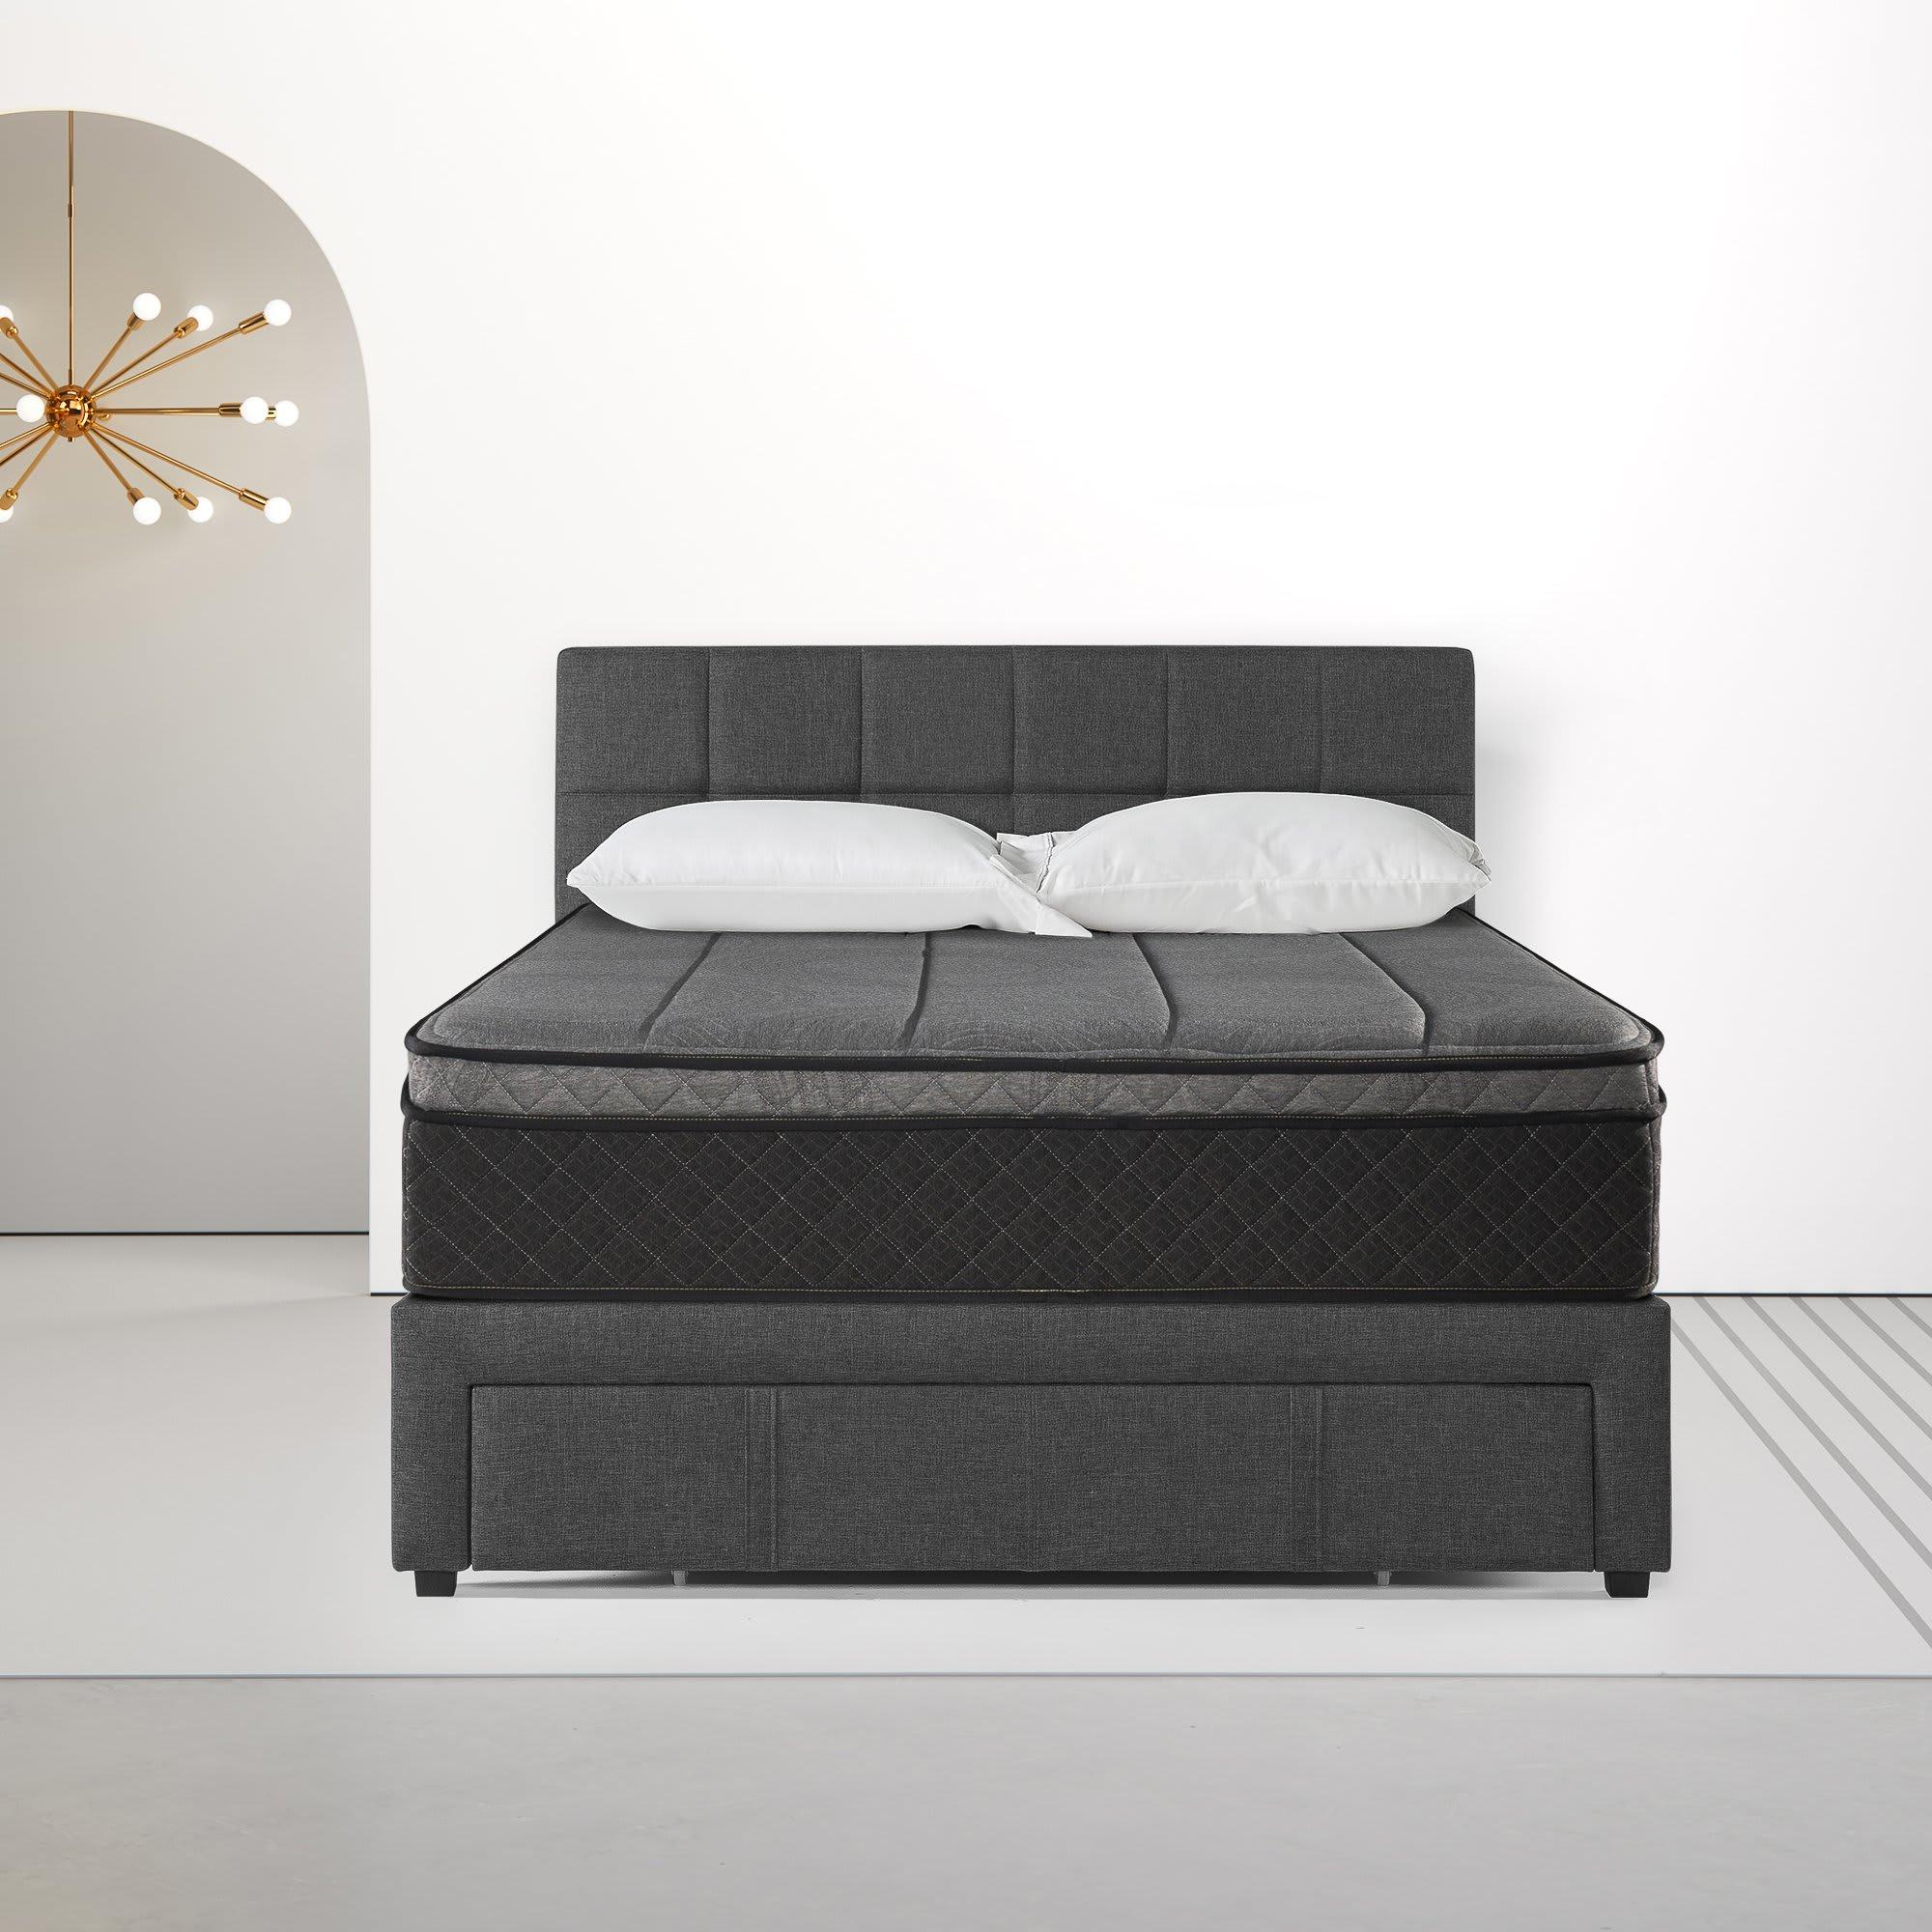 Lottie Storage Platform Bed and Euro Top iCoil® Hybrid Mattress Set